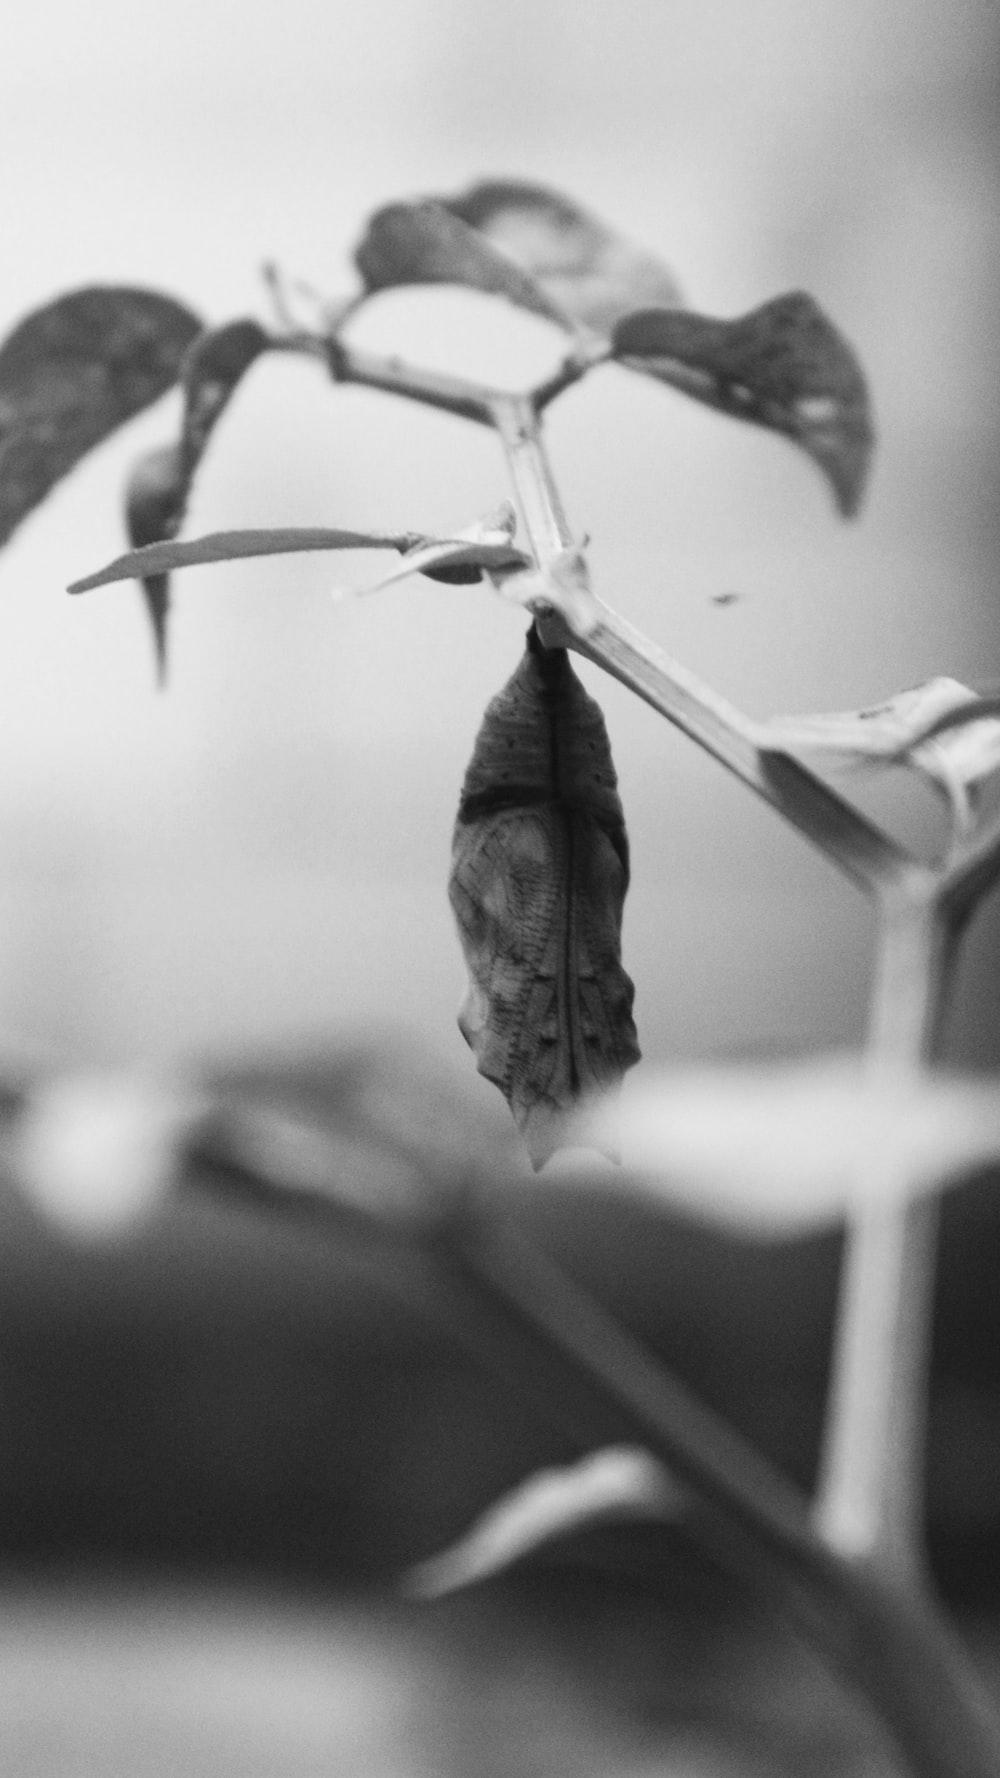 grayscale photography of gray animal